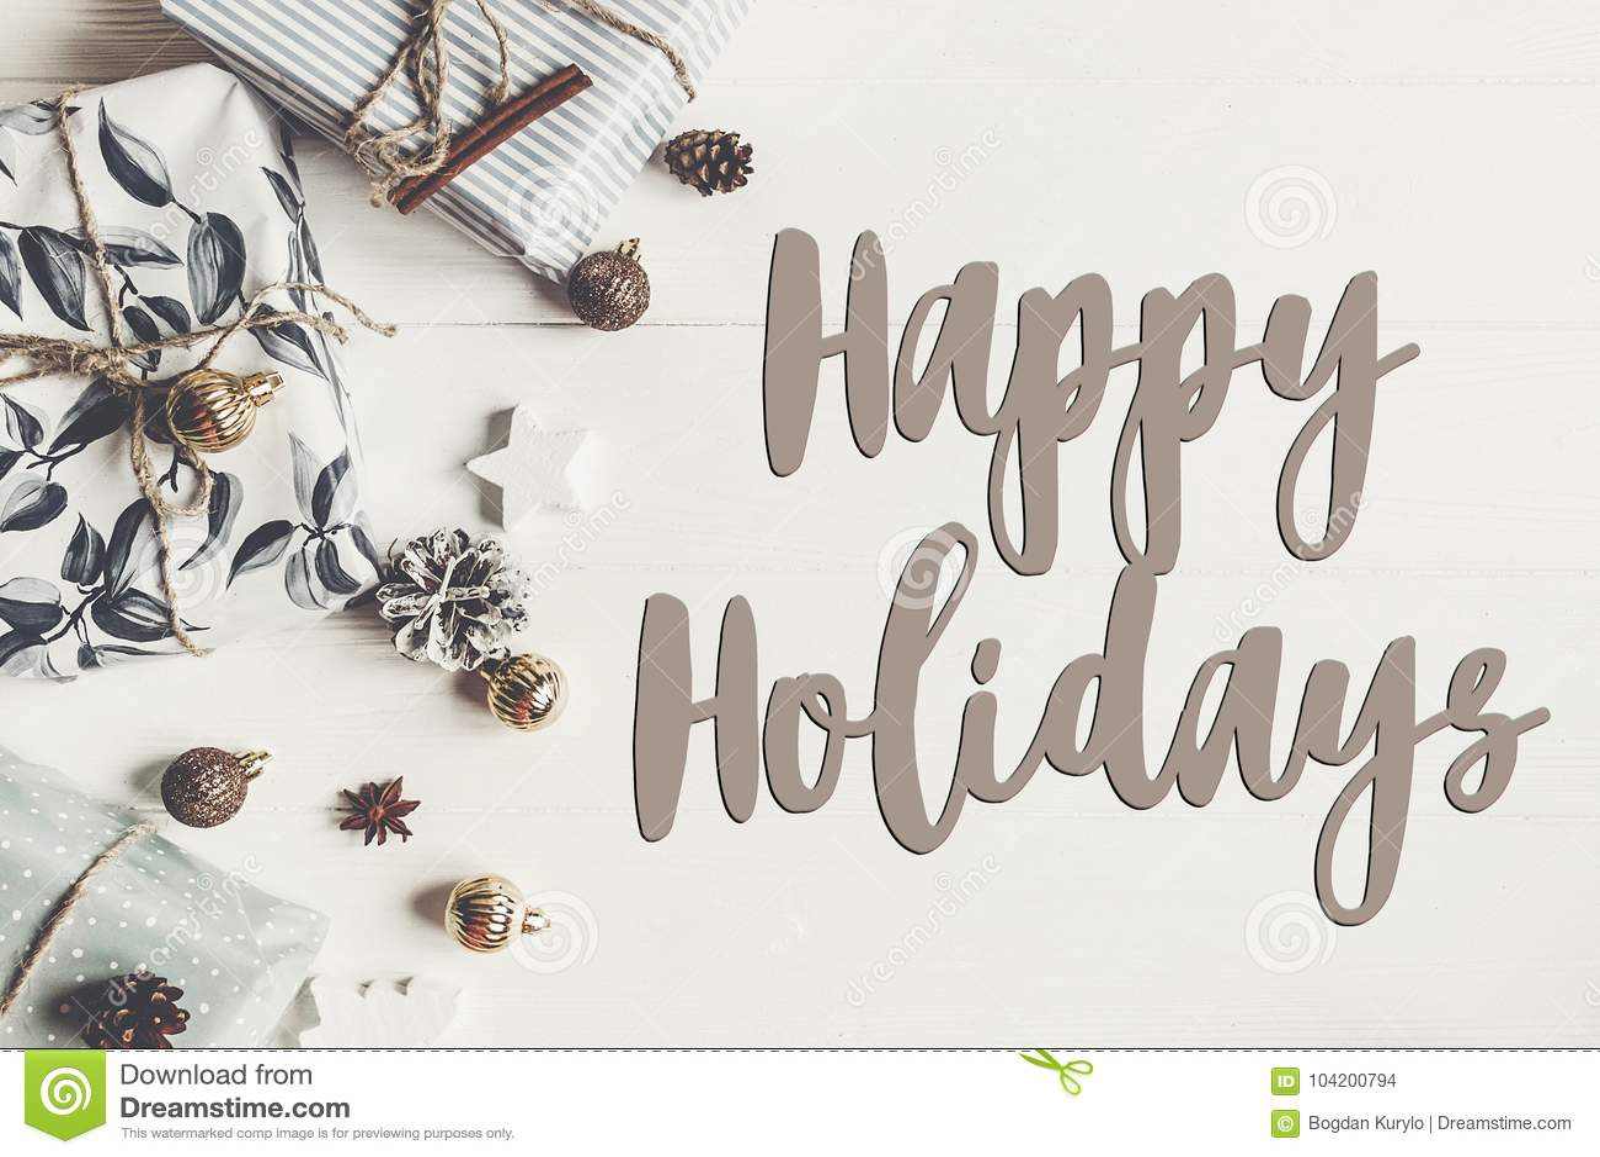 Happy holidays text, seasonal greetings card sign. stylish mode